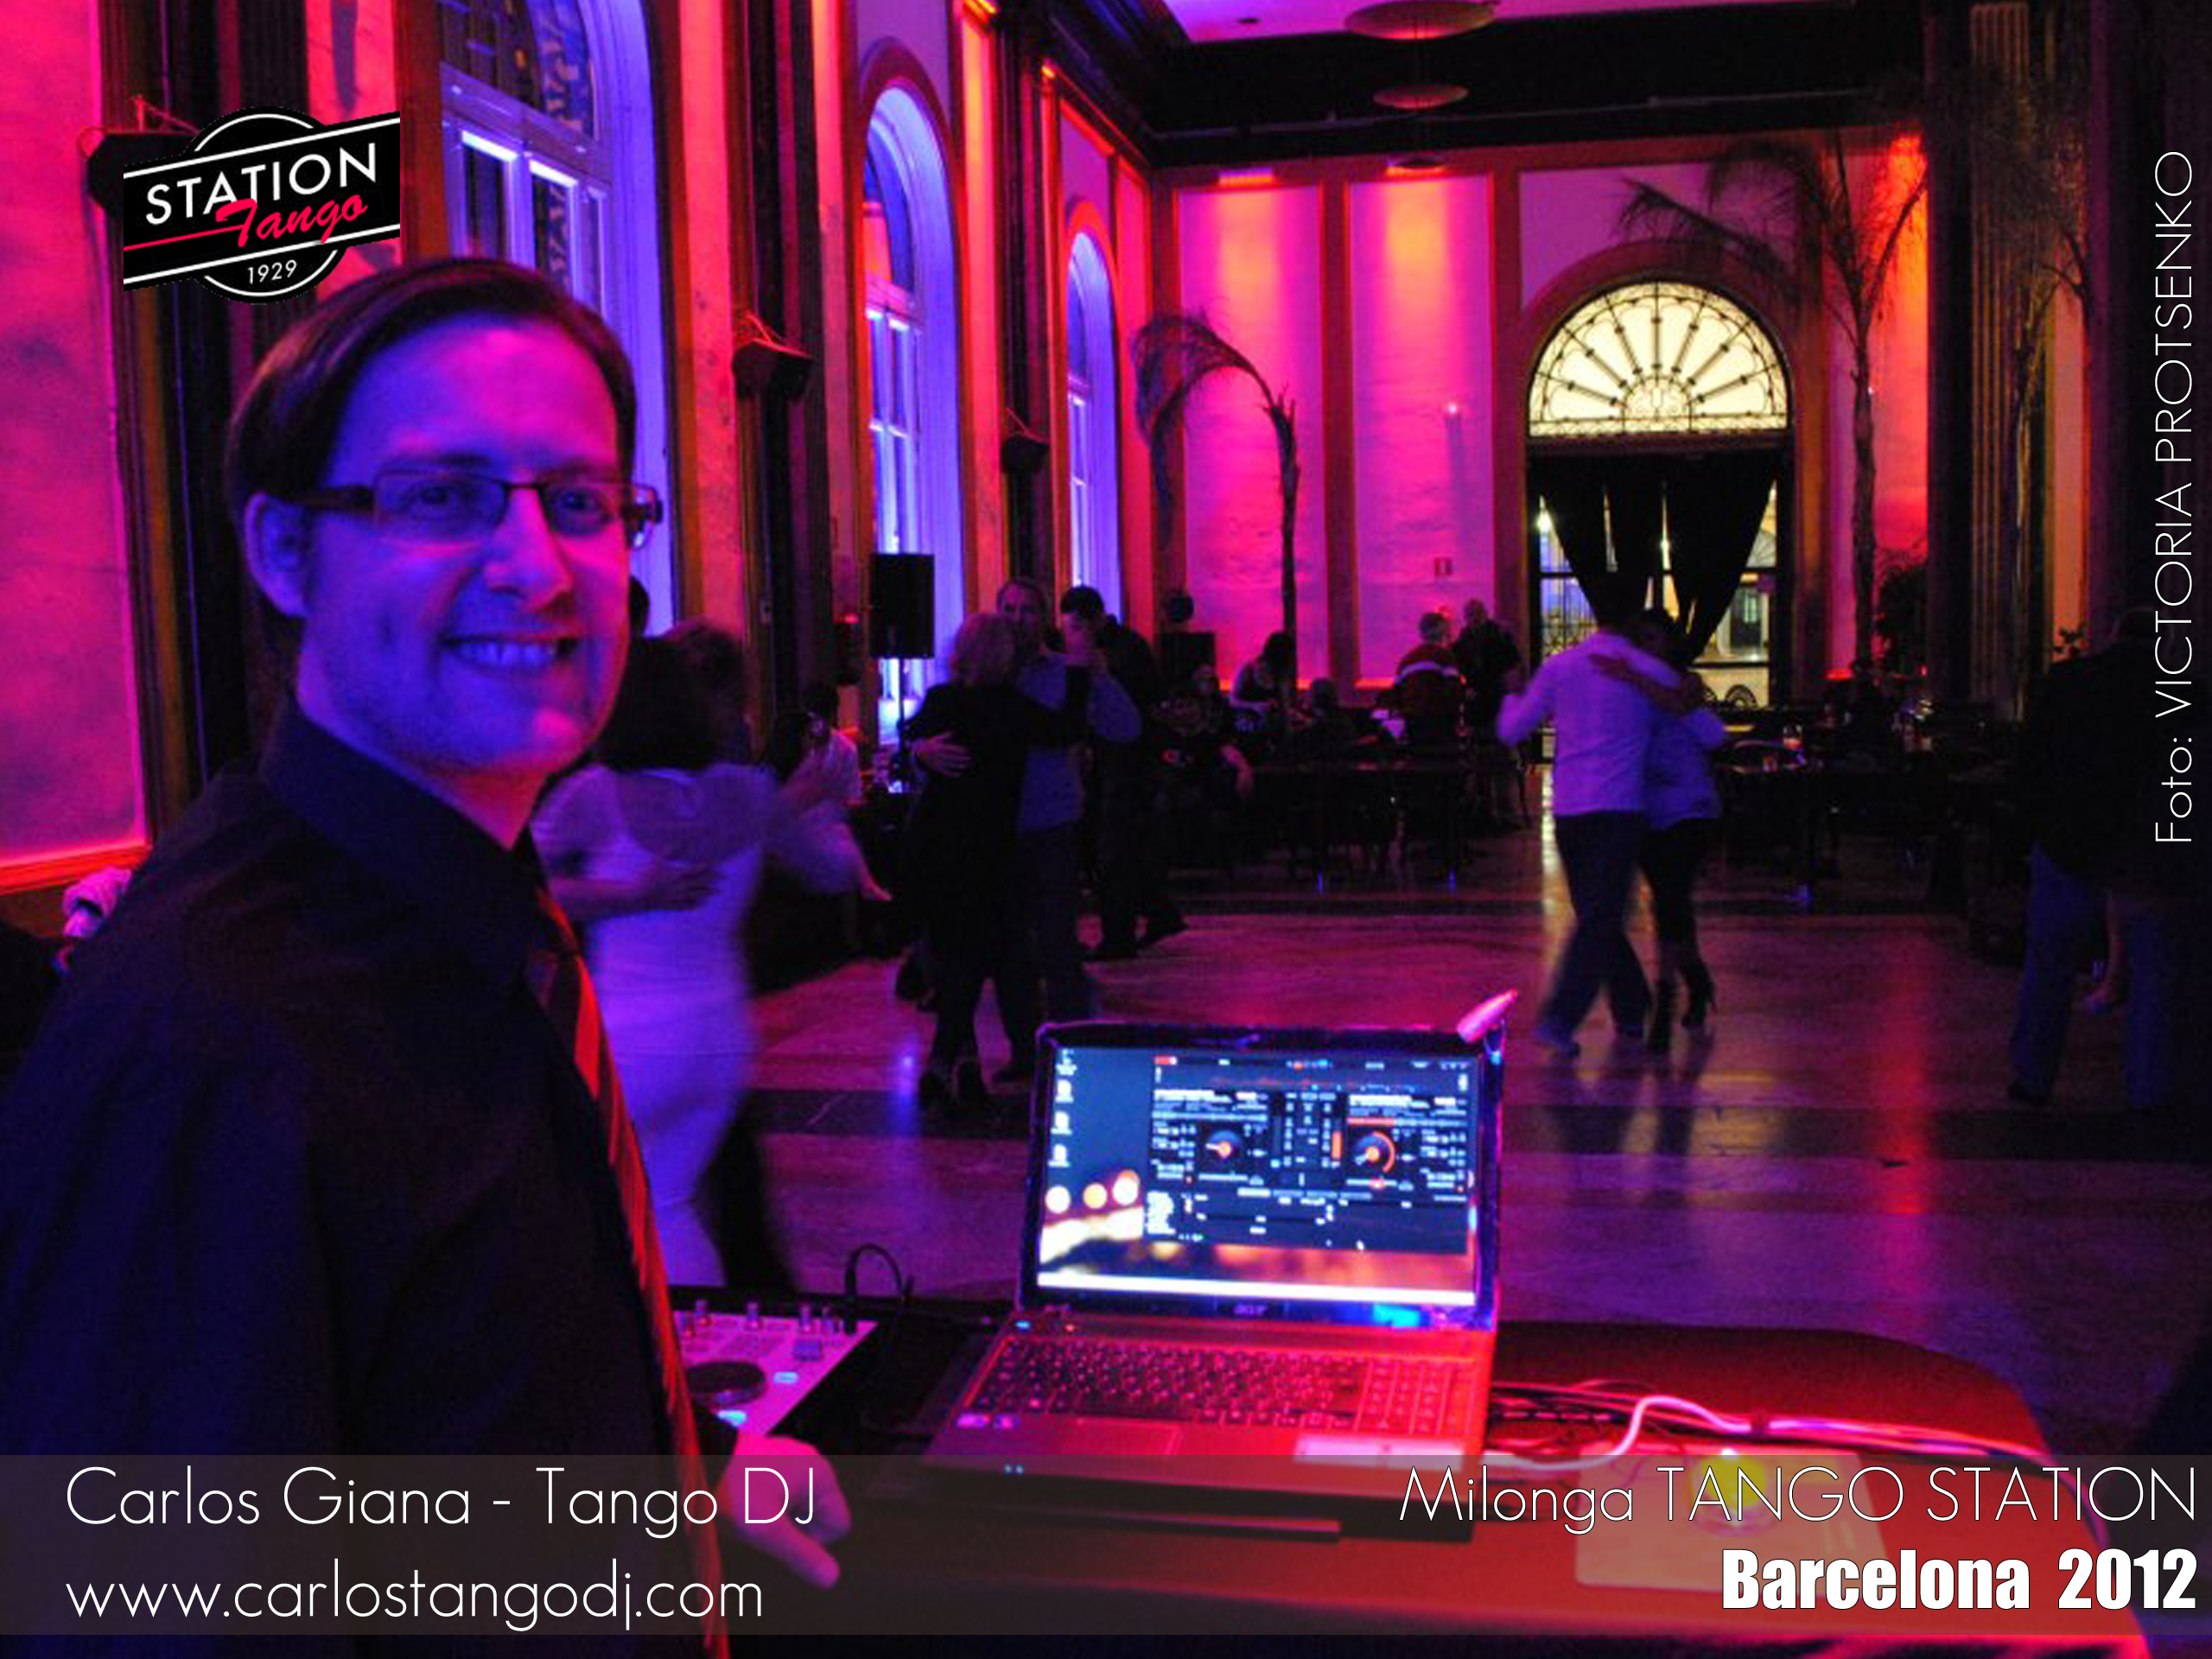 Milonga Tango Station Barcelona 2012 03